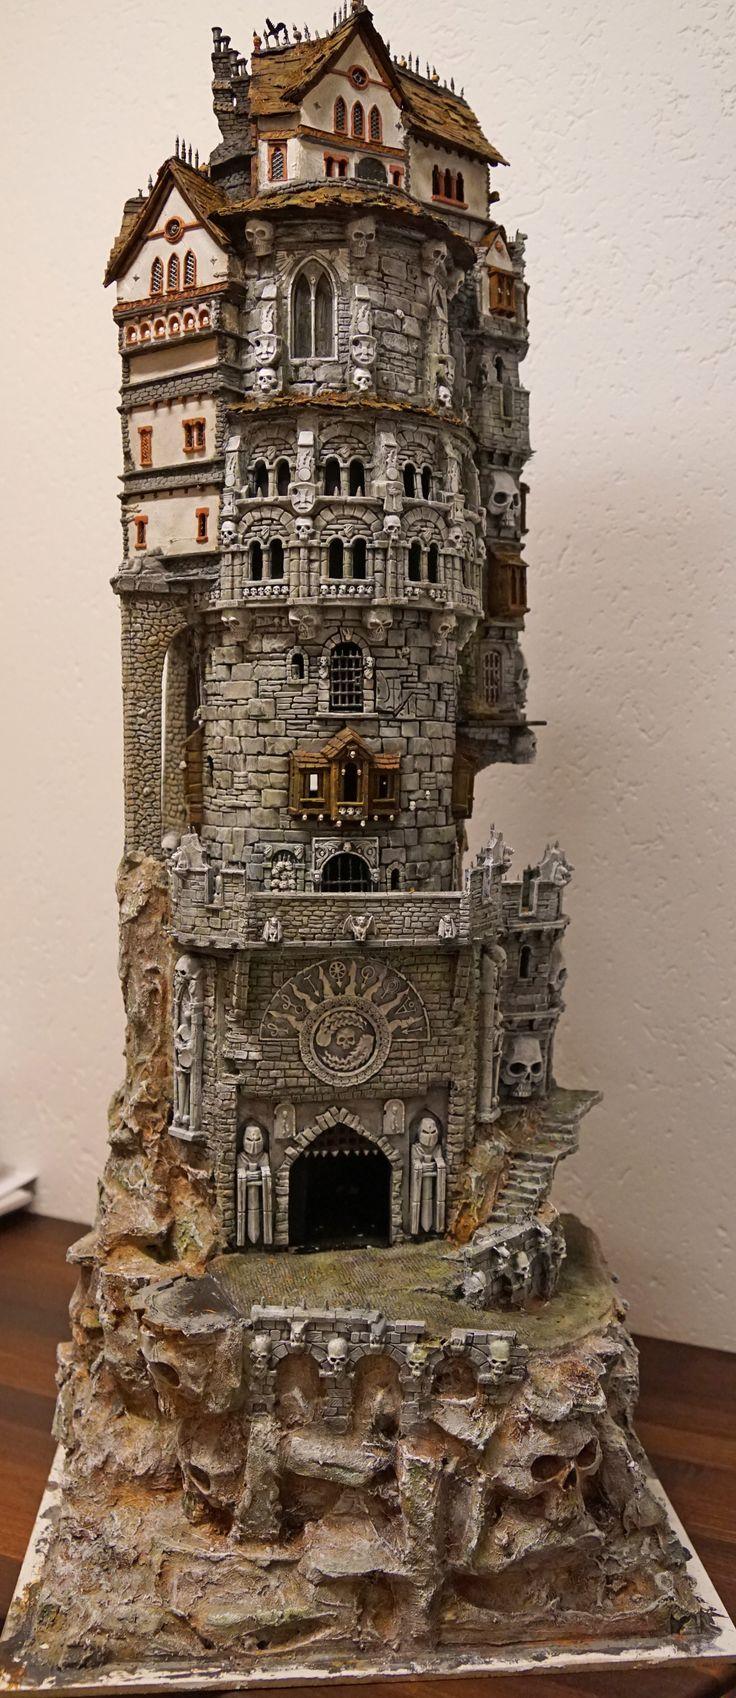 Diy Miniature Stone Houses 24 - Cutest DIY Miniature Stone House Ideas